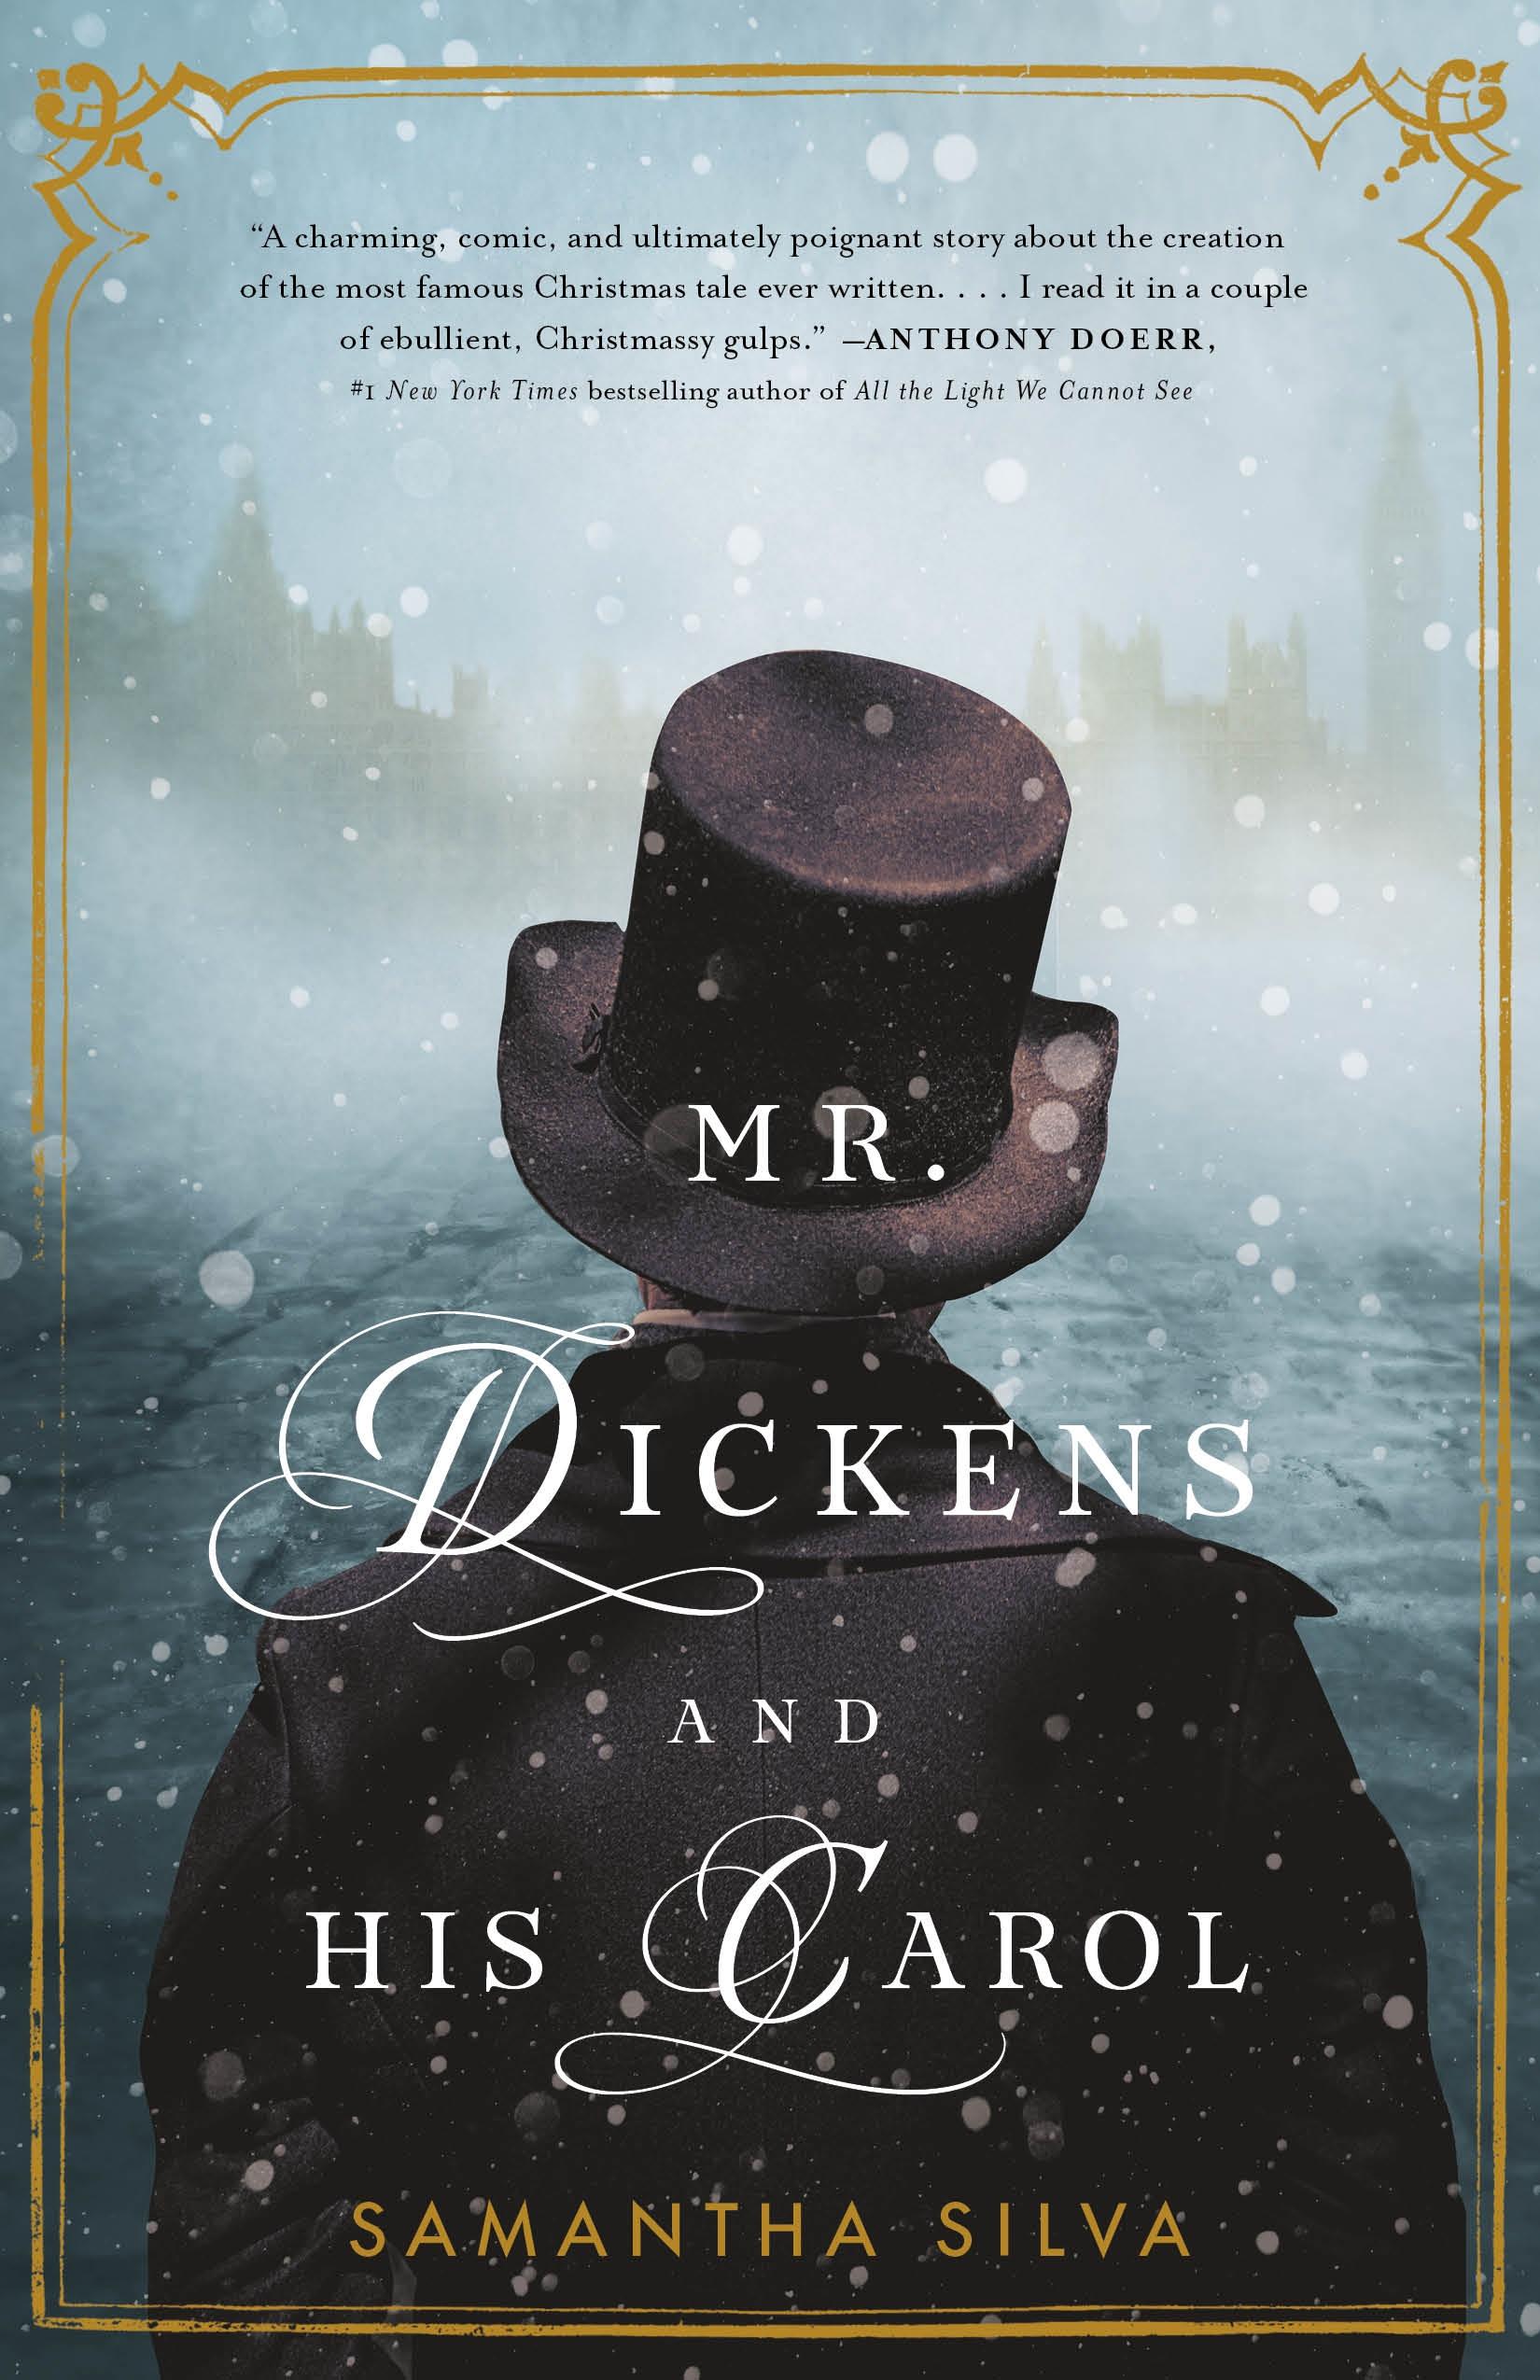 mr dickens and his carol by smantha silva.jpg